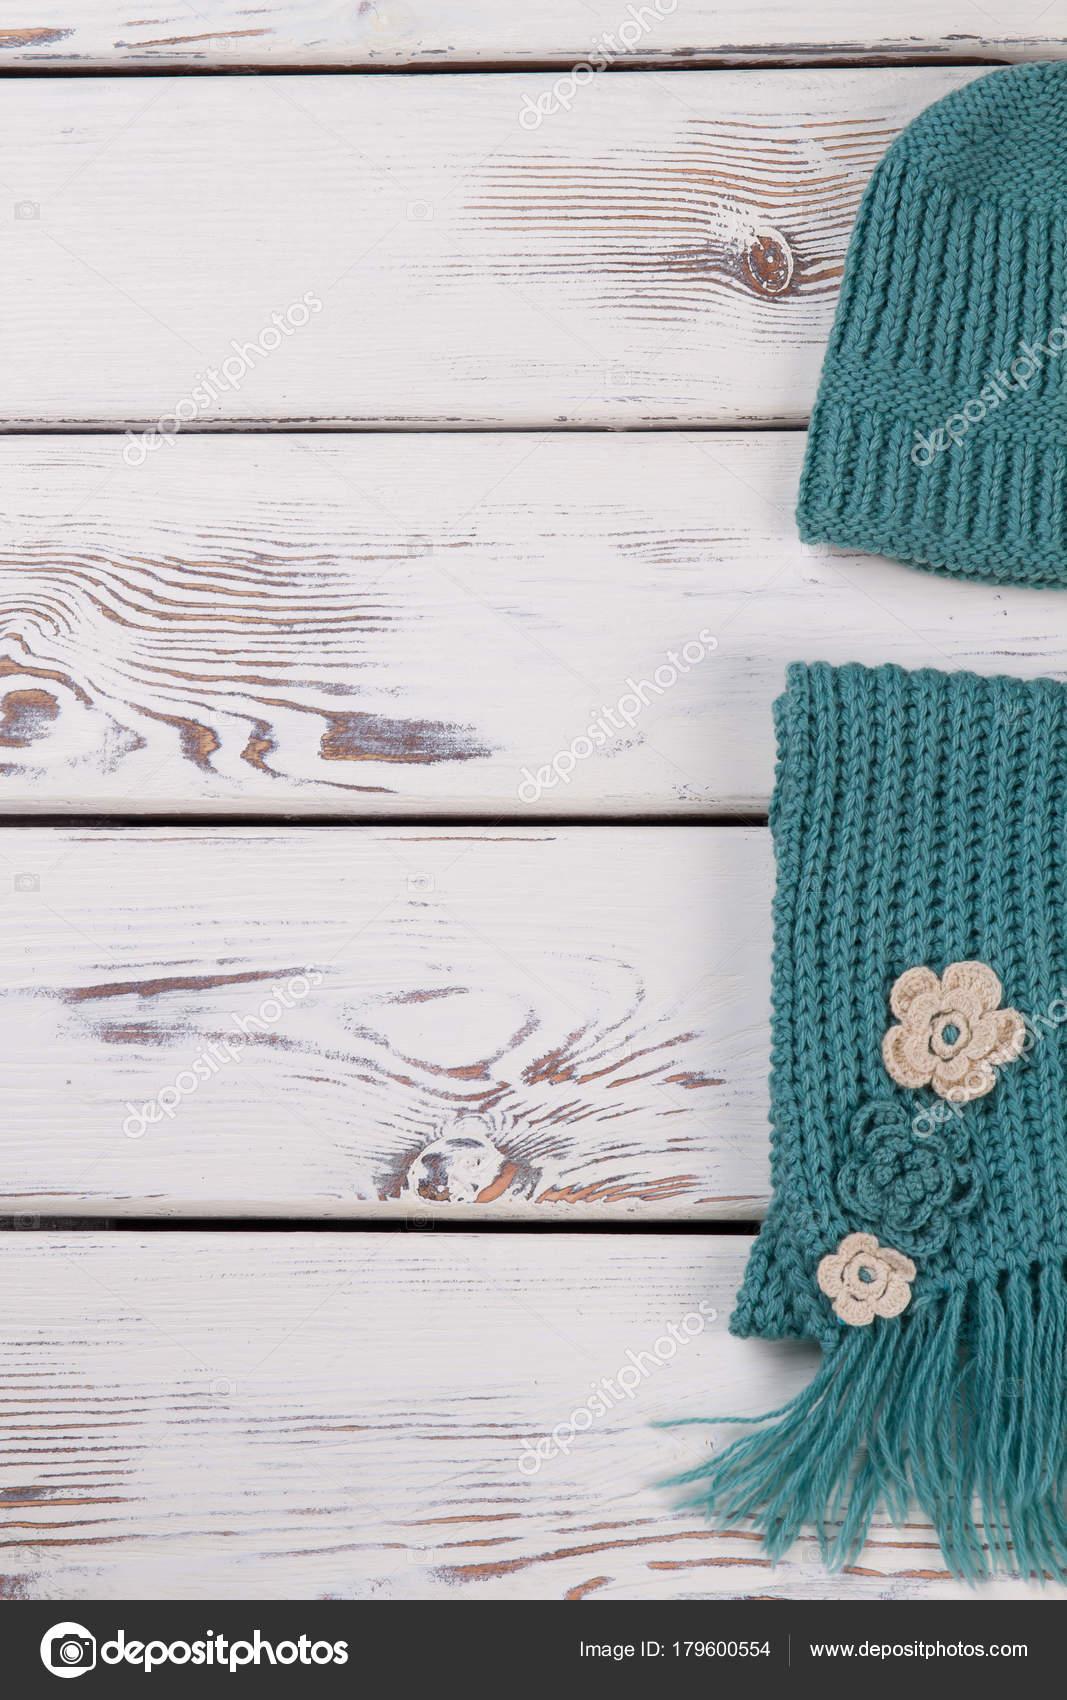 Bufanda y gorro tejido mano — Foto de stock © margostock #179600554